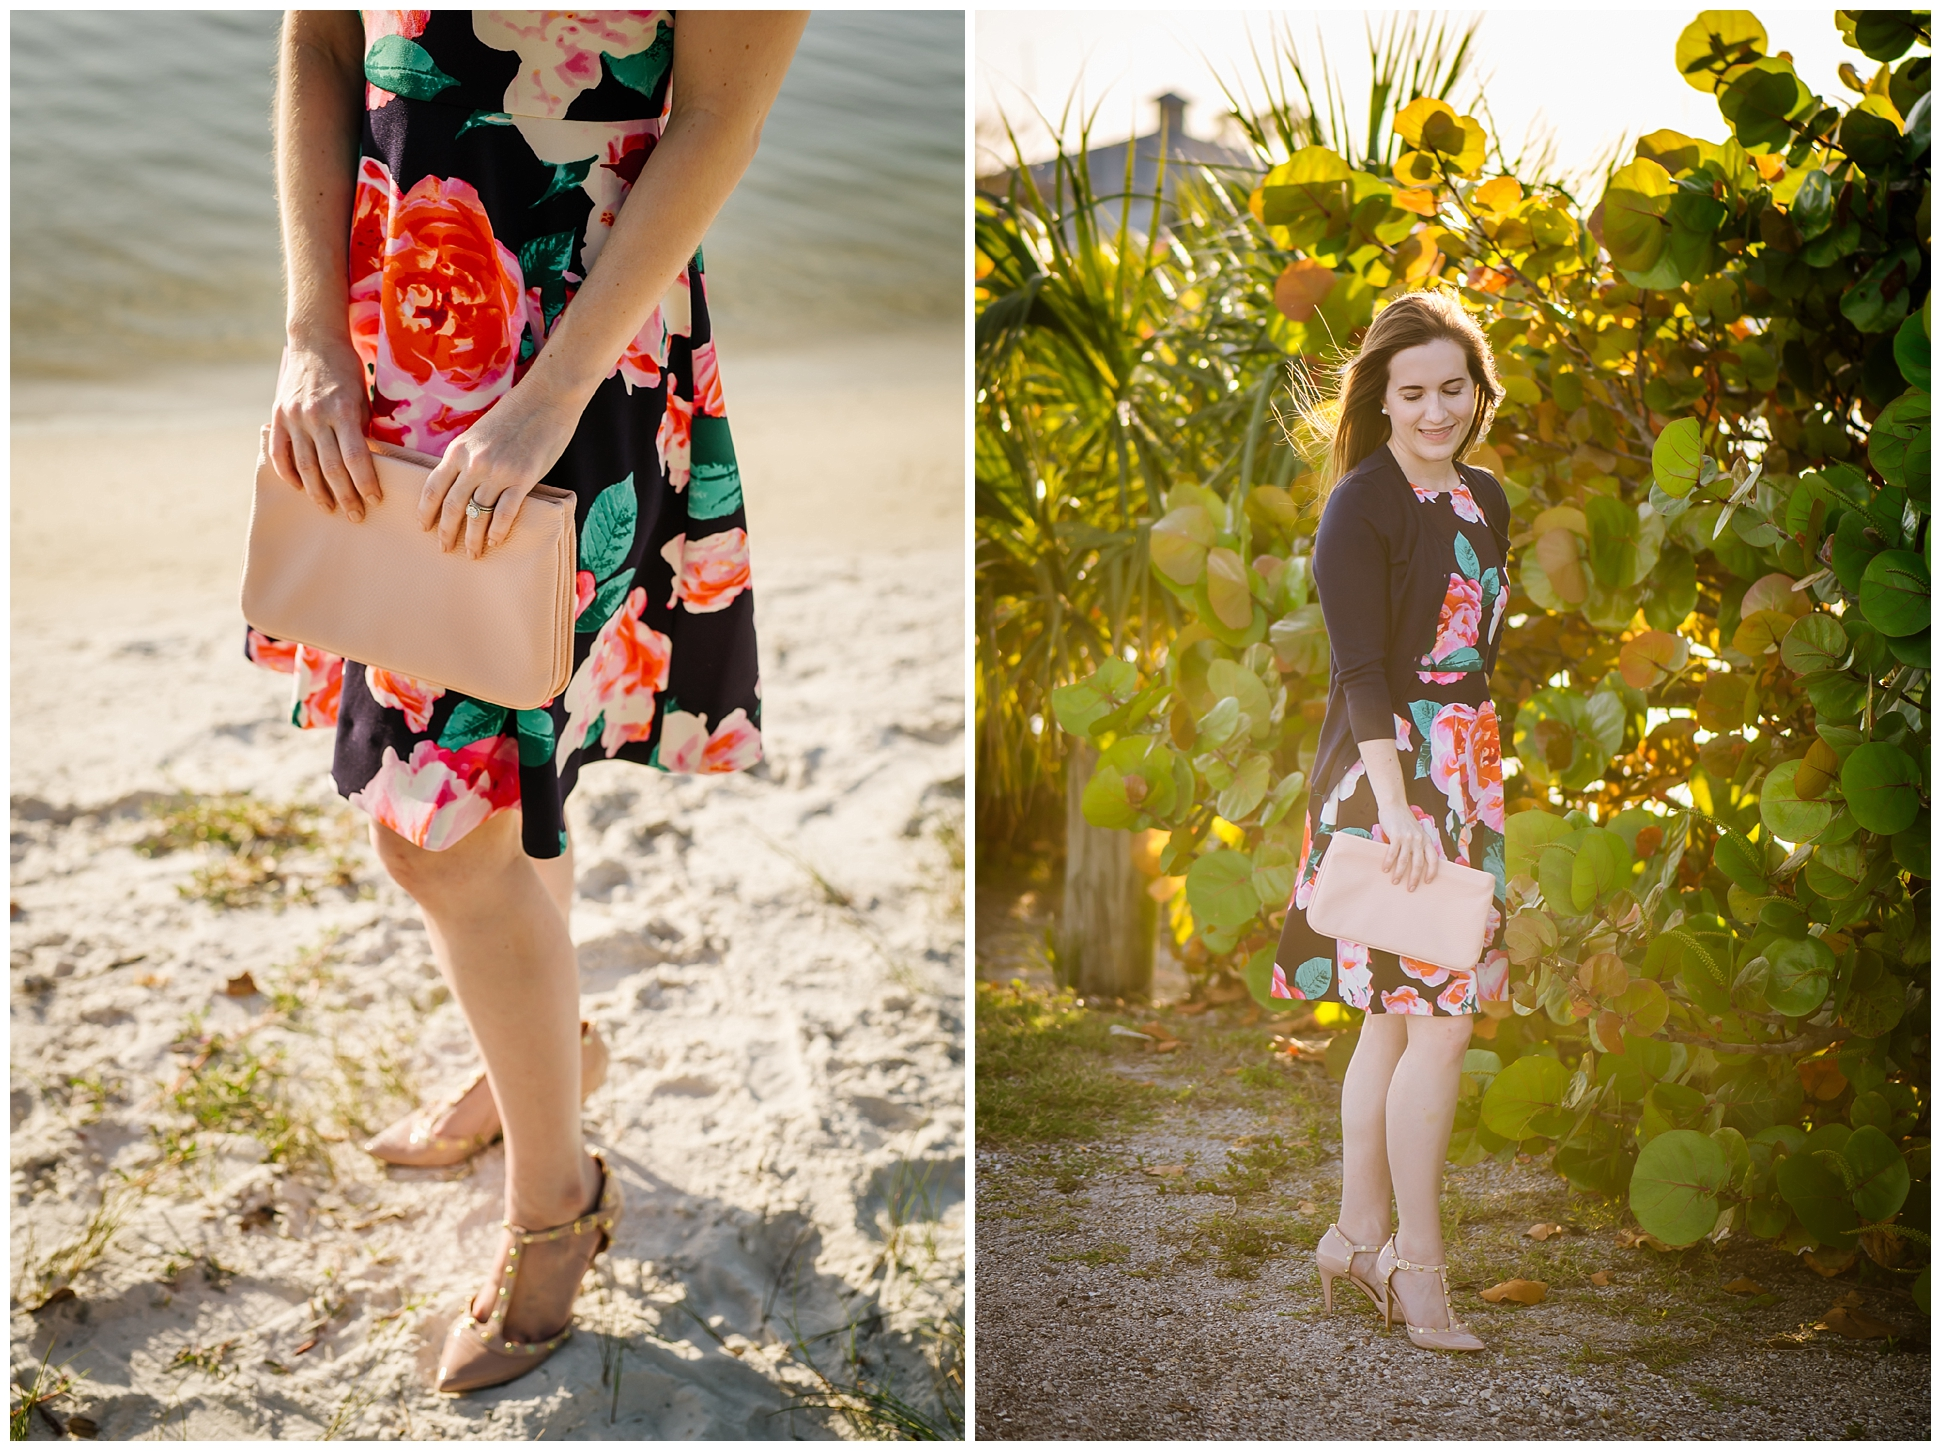 Tampa-lifestyle-bradning-fashion-blogger-photographer_0037.jpg